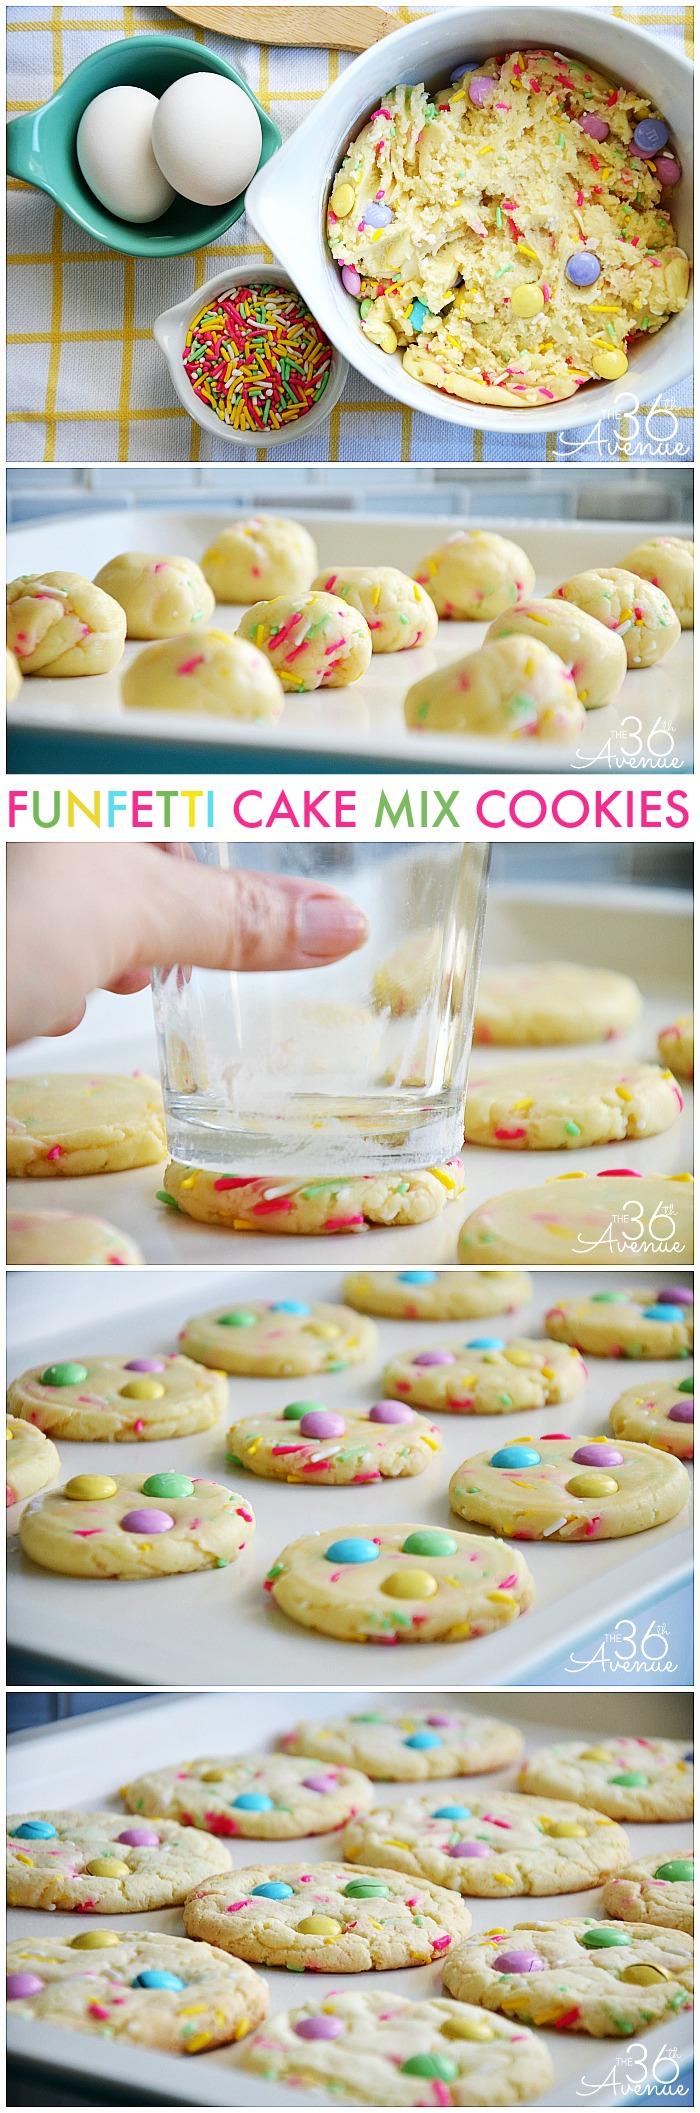 Funfetti Cake Box Cookie Recipes